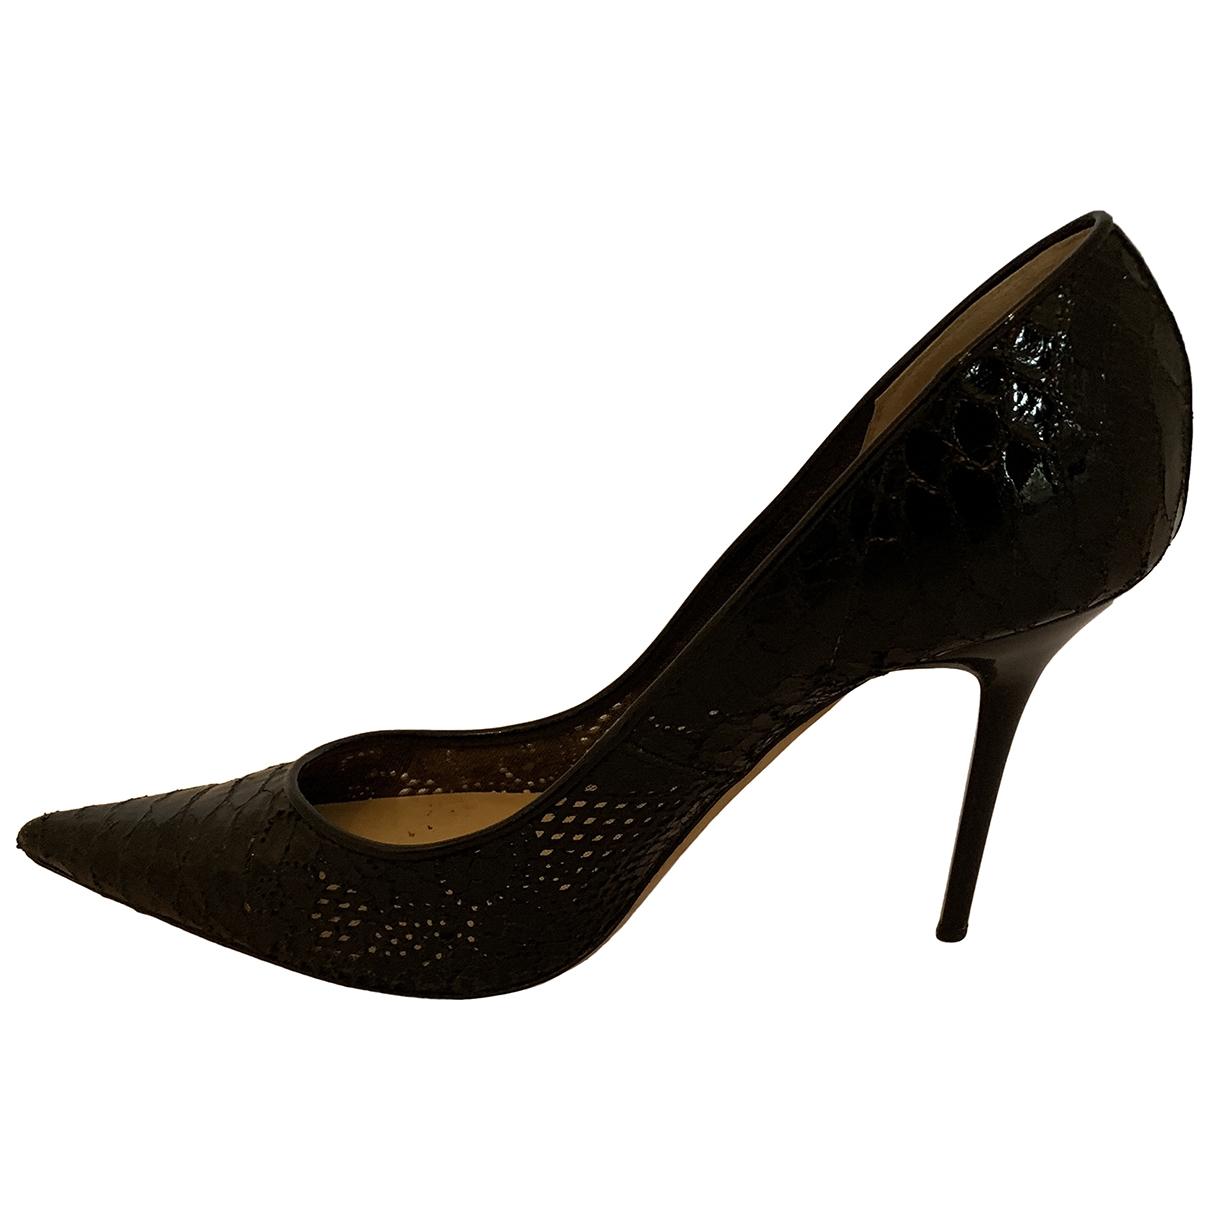 Jimmy Choo \N Black Patent leather Heels for Women 34.5 EU